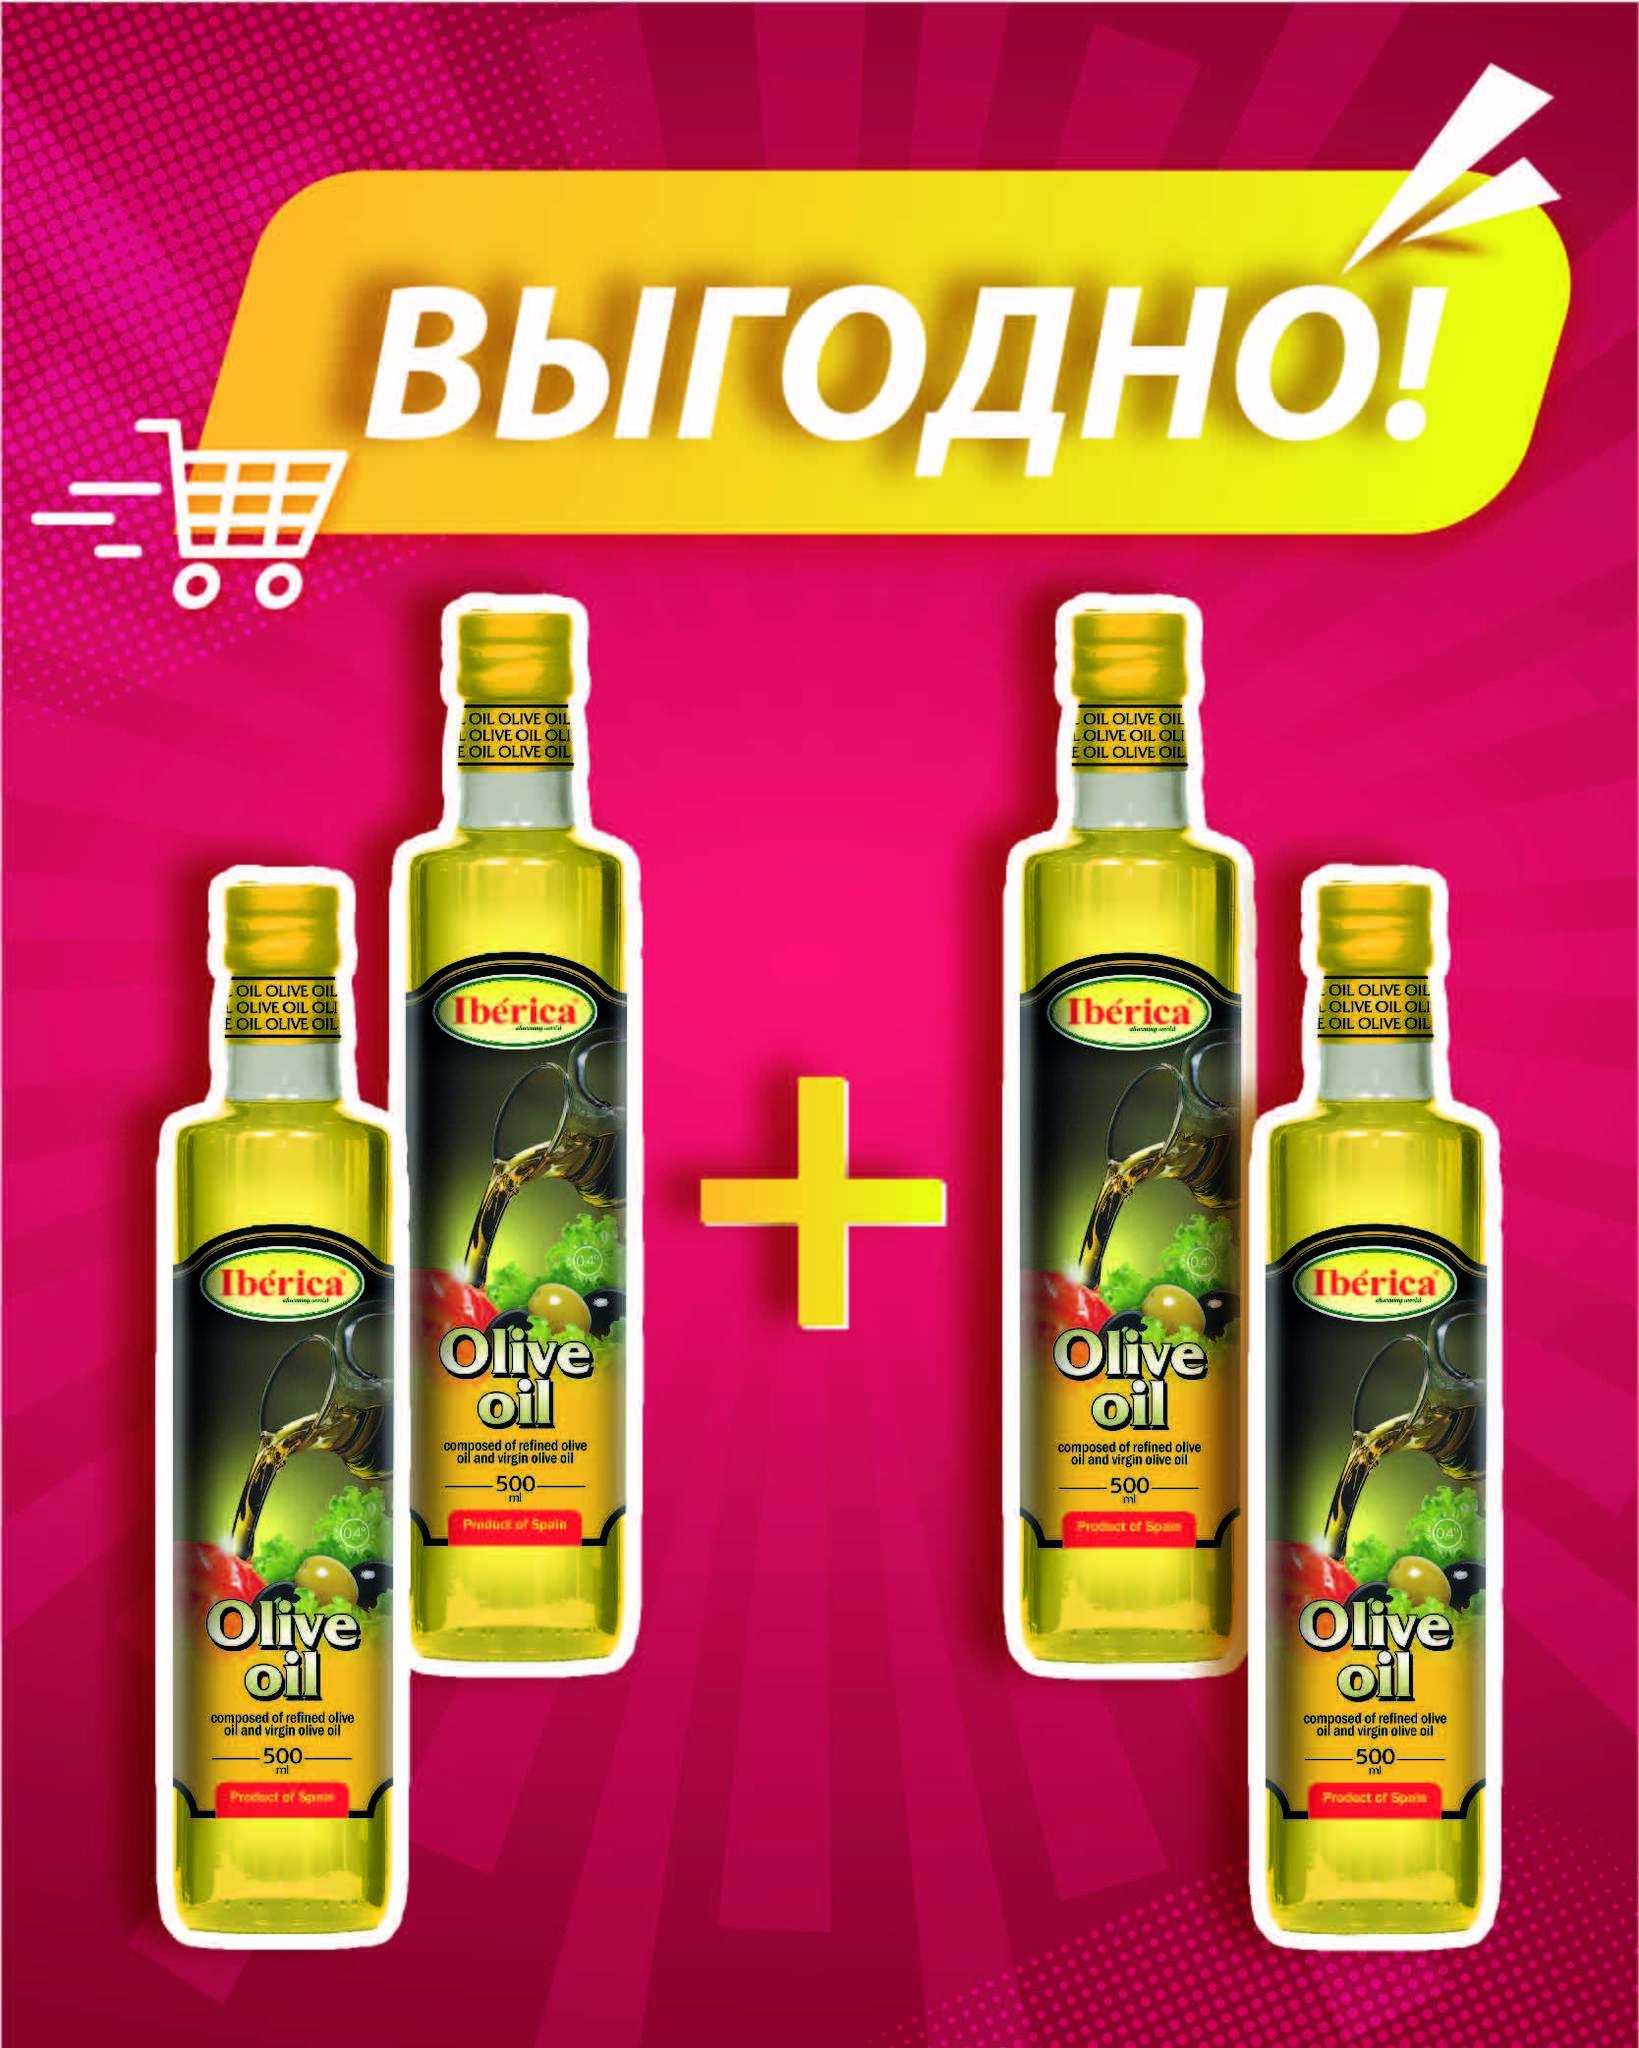 Набор Оливкового масла Iberica 100% 0,5л. из 4 шт.